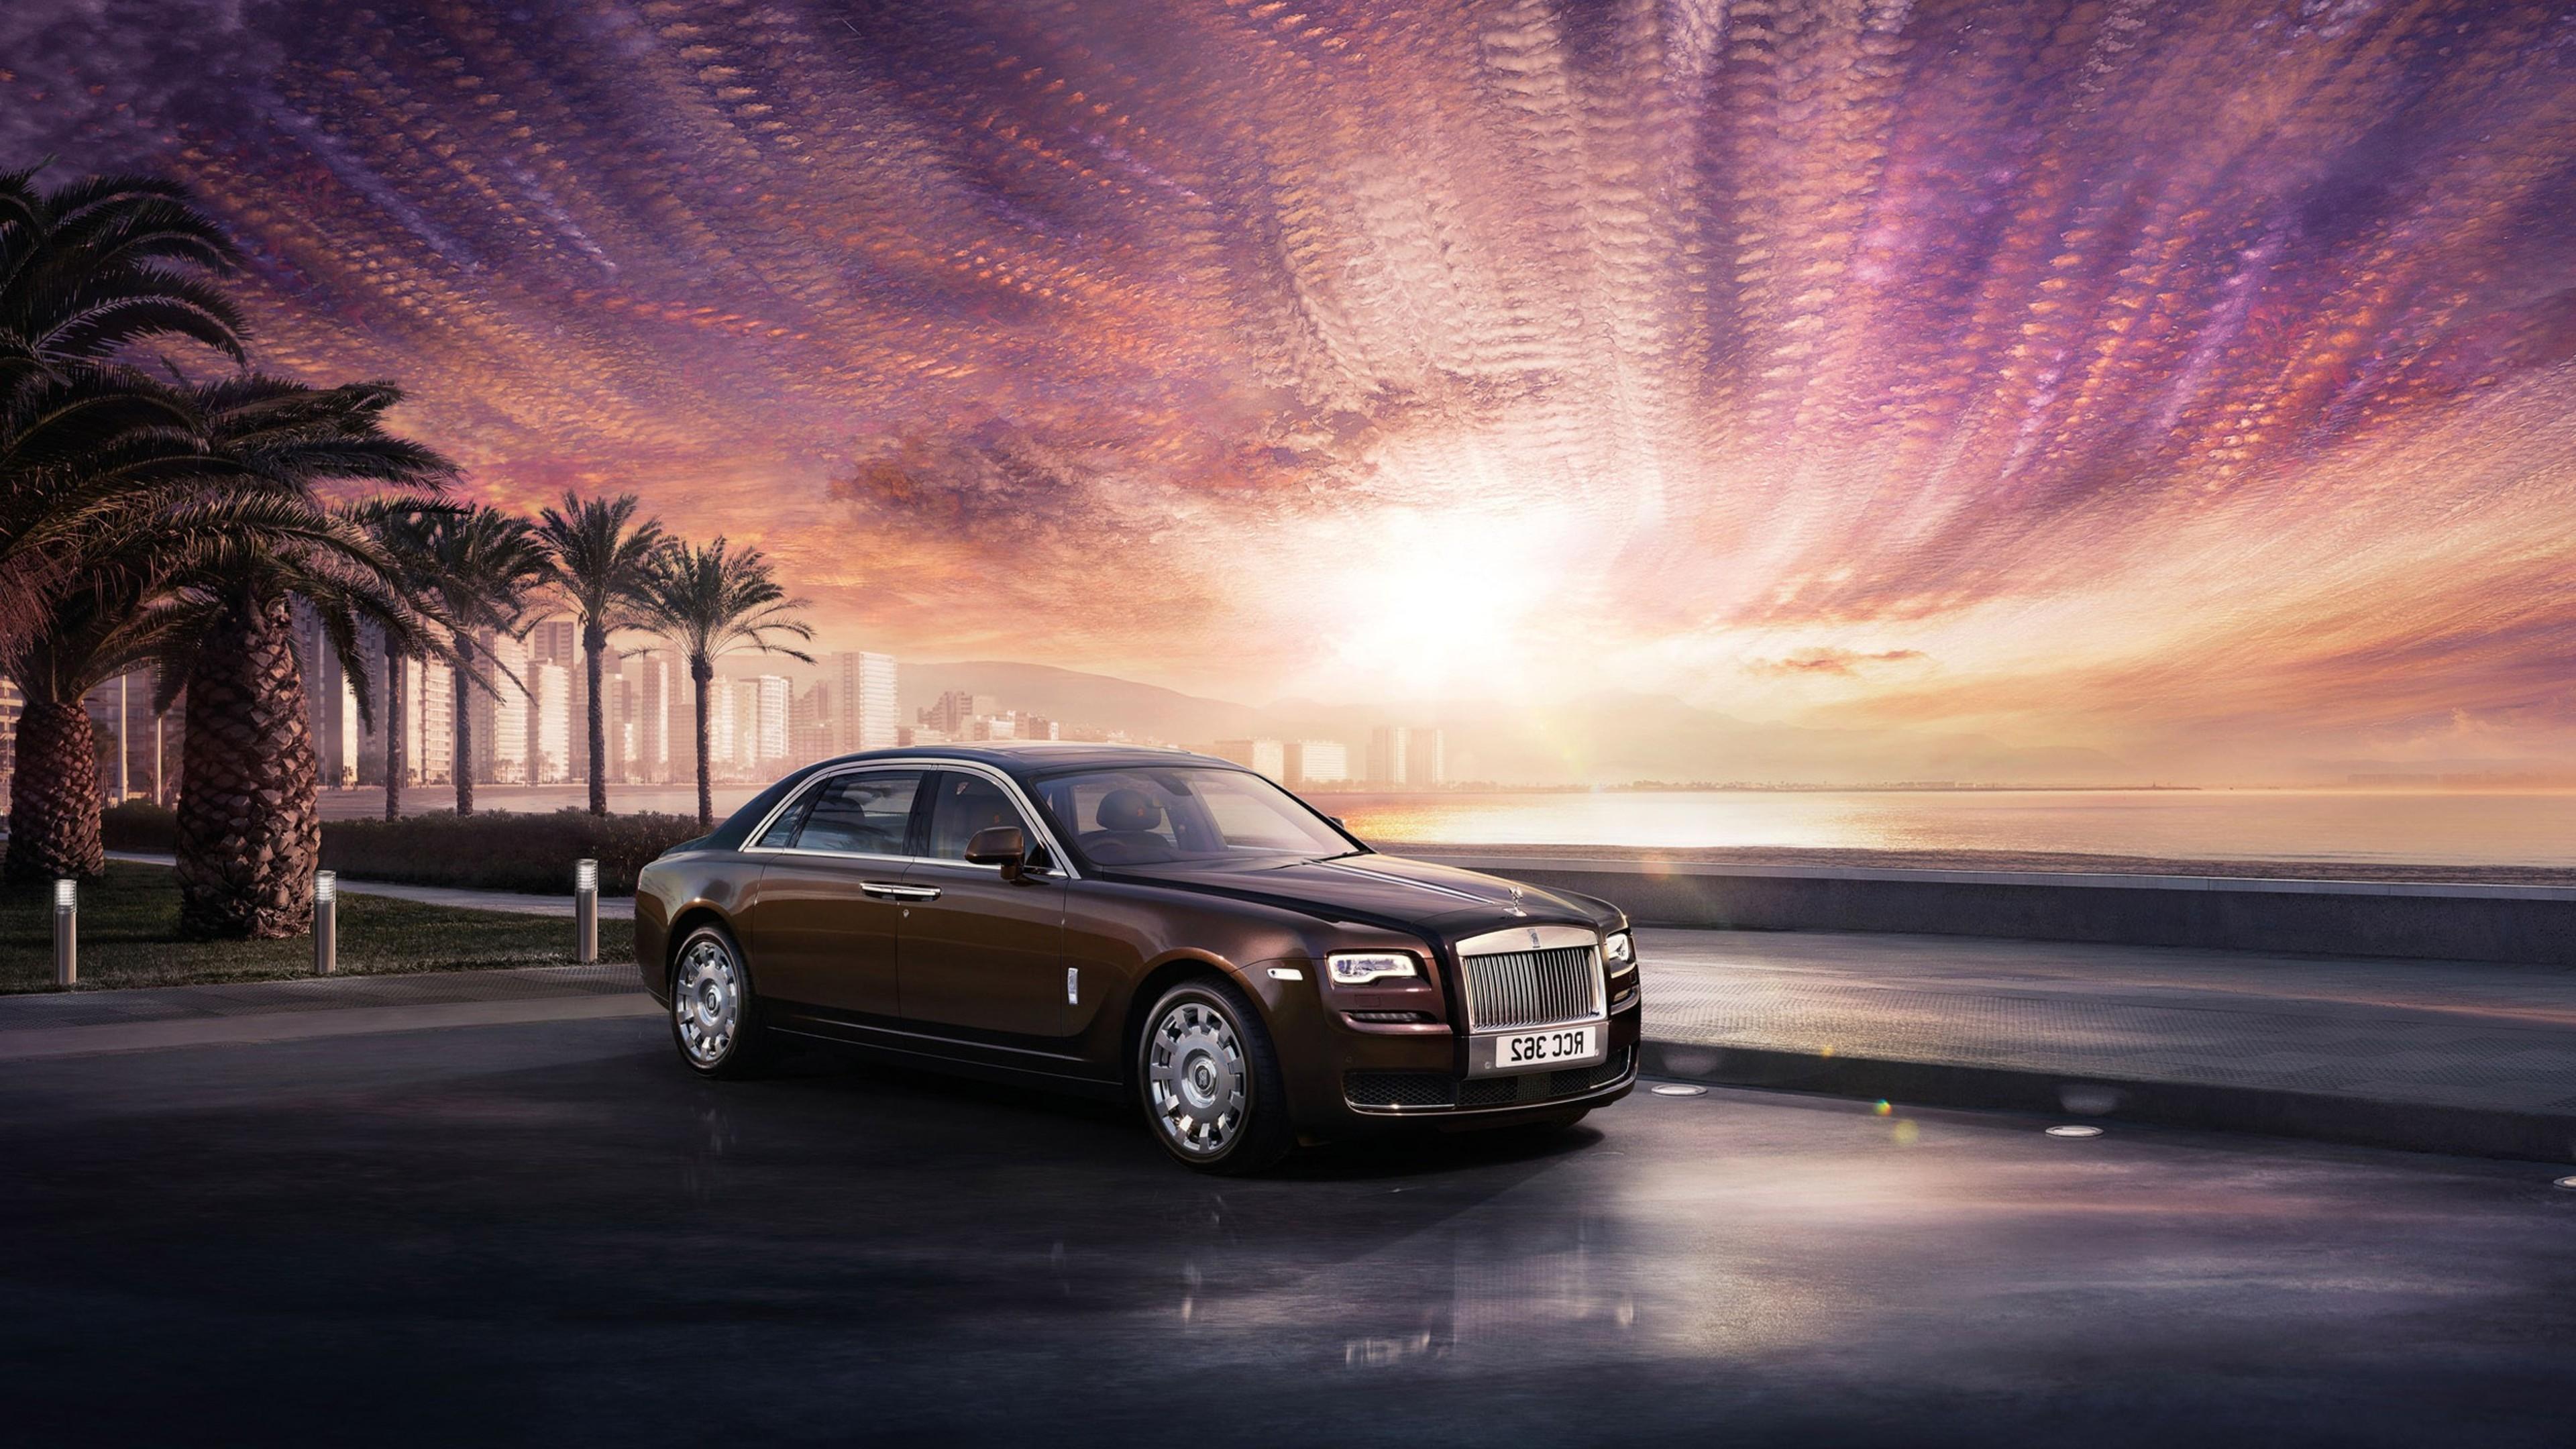 Rolls Royce Ghost Series 2016, HD Cars, 4k Wallpapers